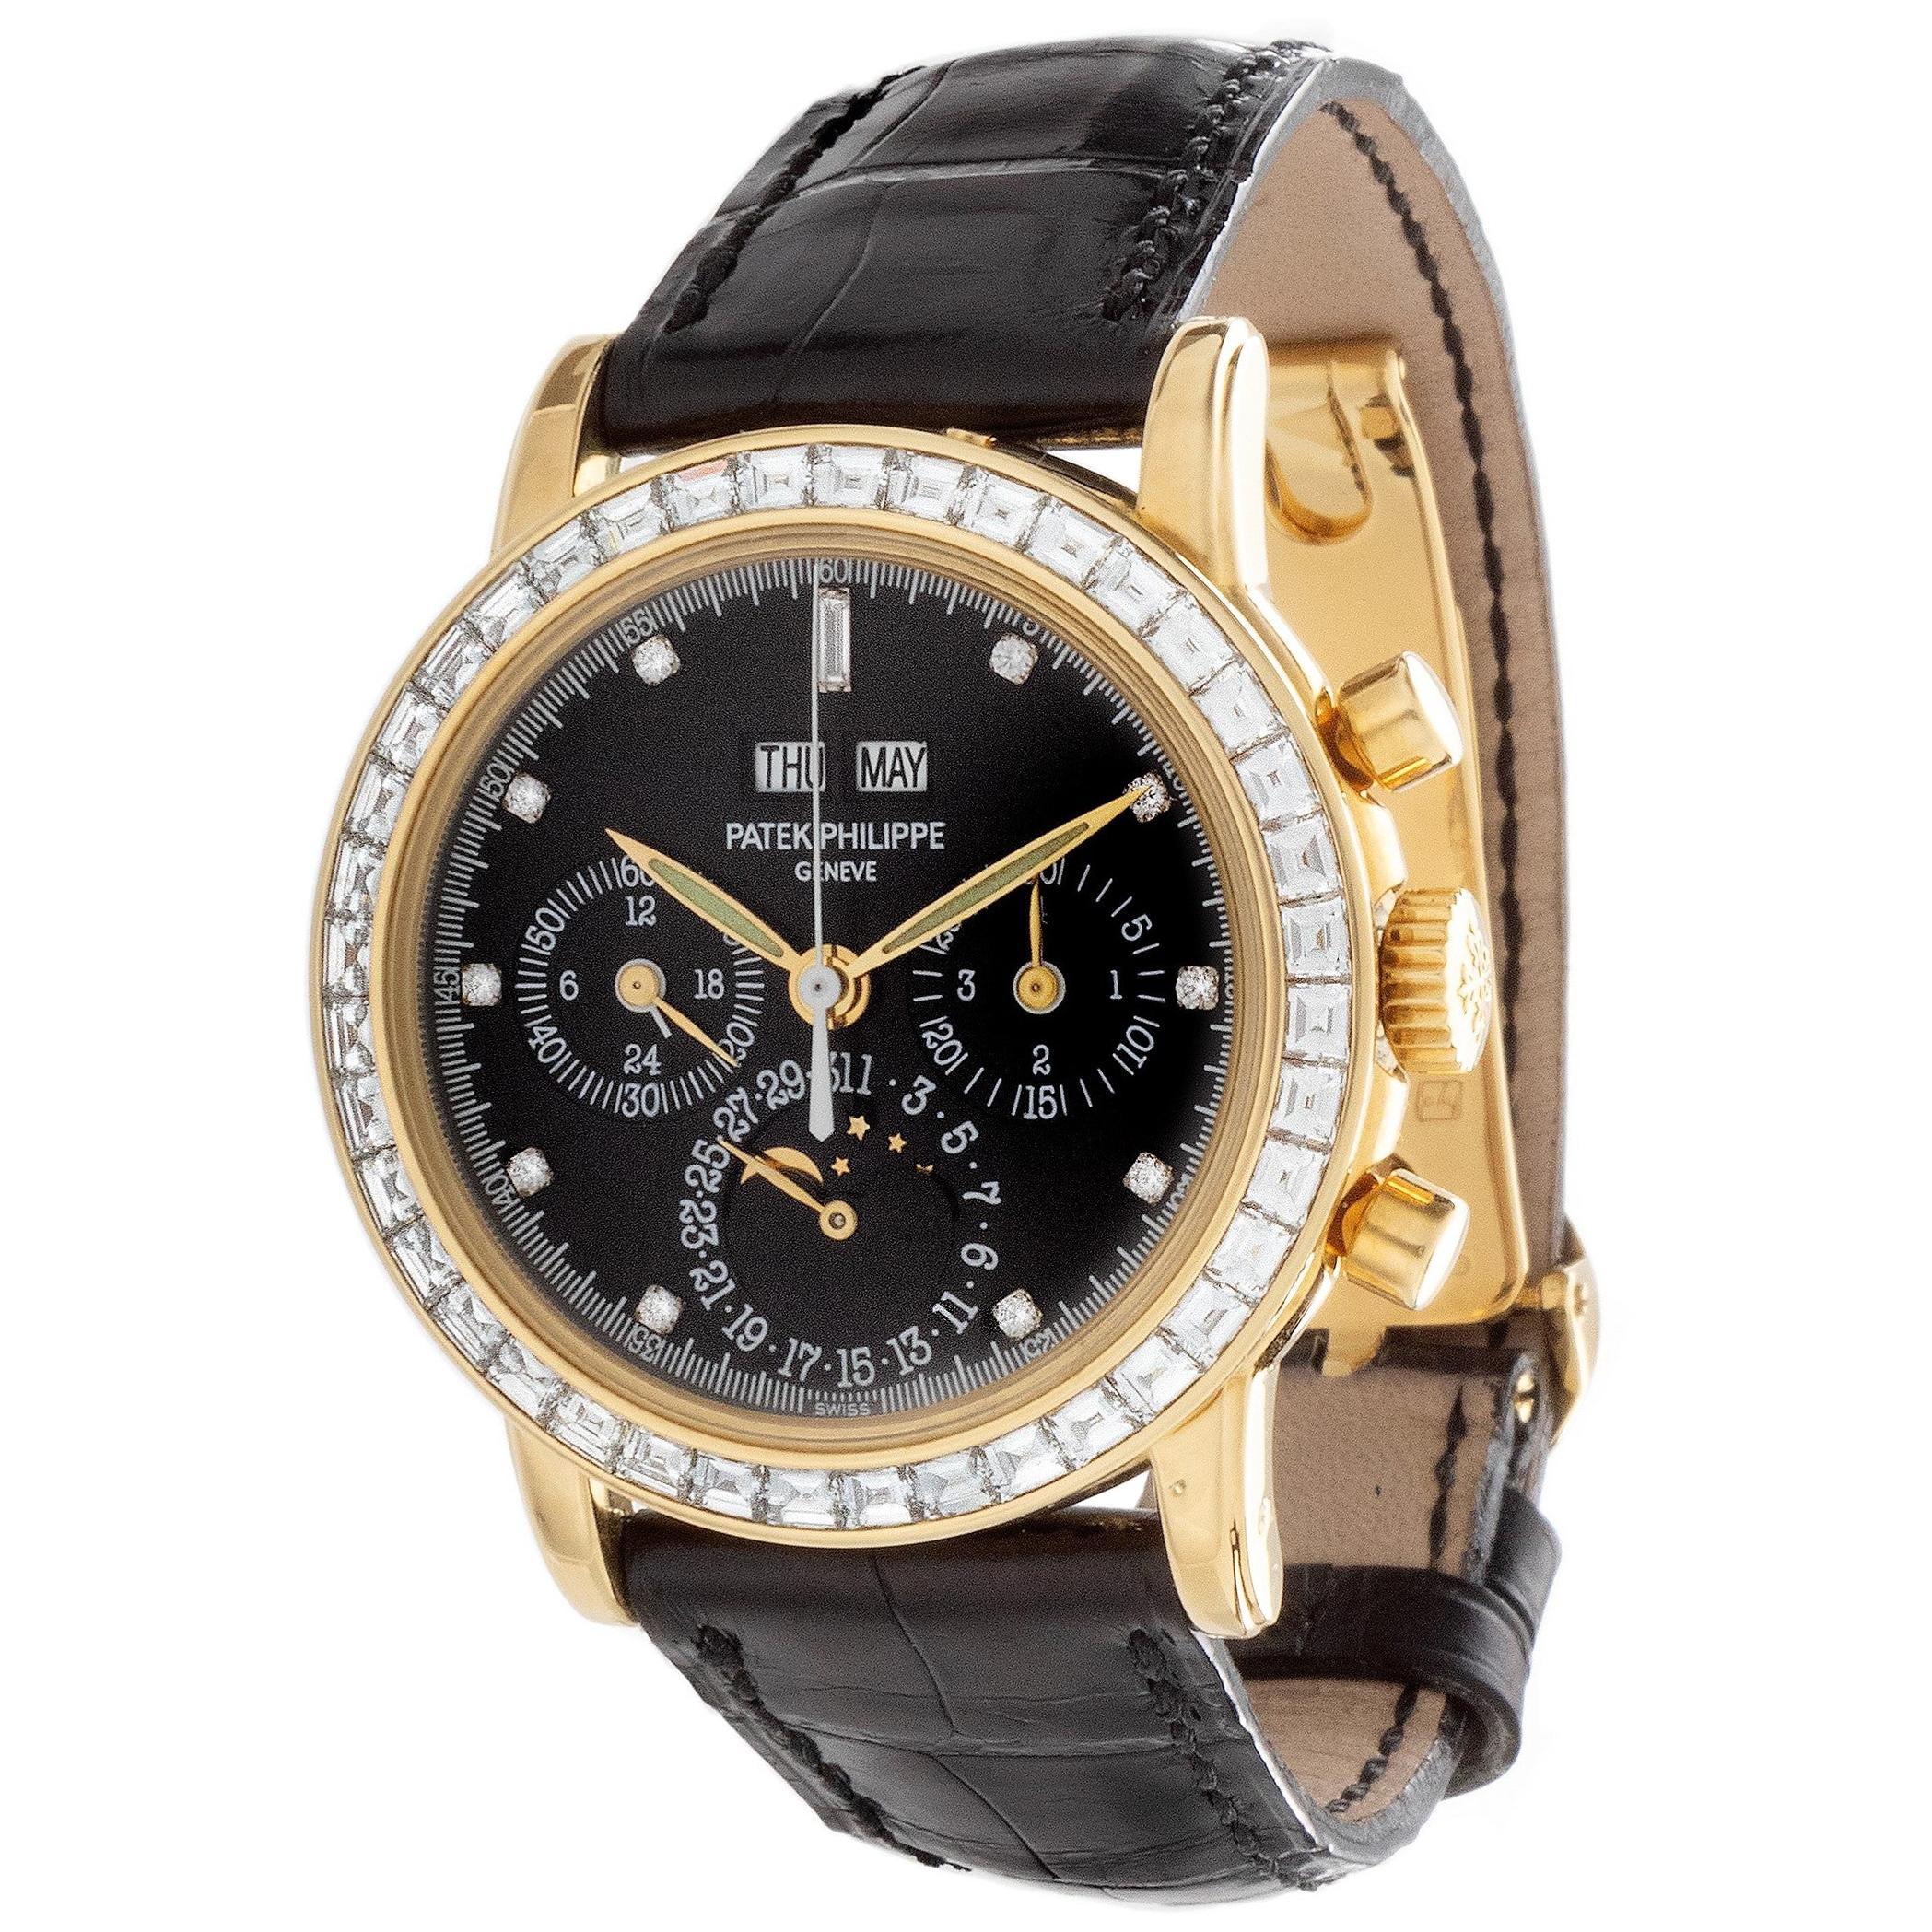 Patek Philippe 3990EJ Perpetual Calendar Chronograph Diamond Bezel Watch